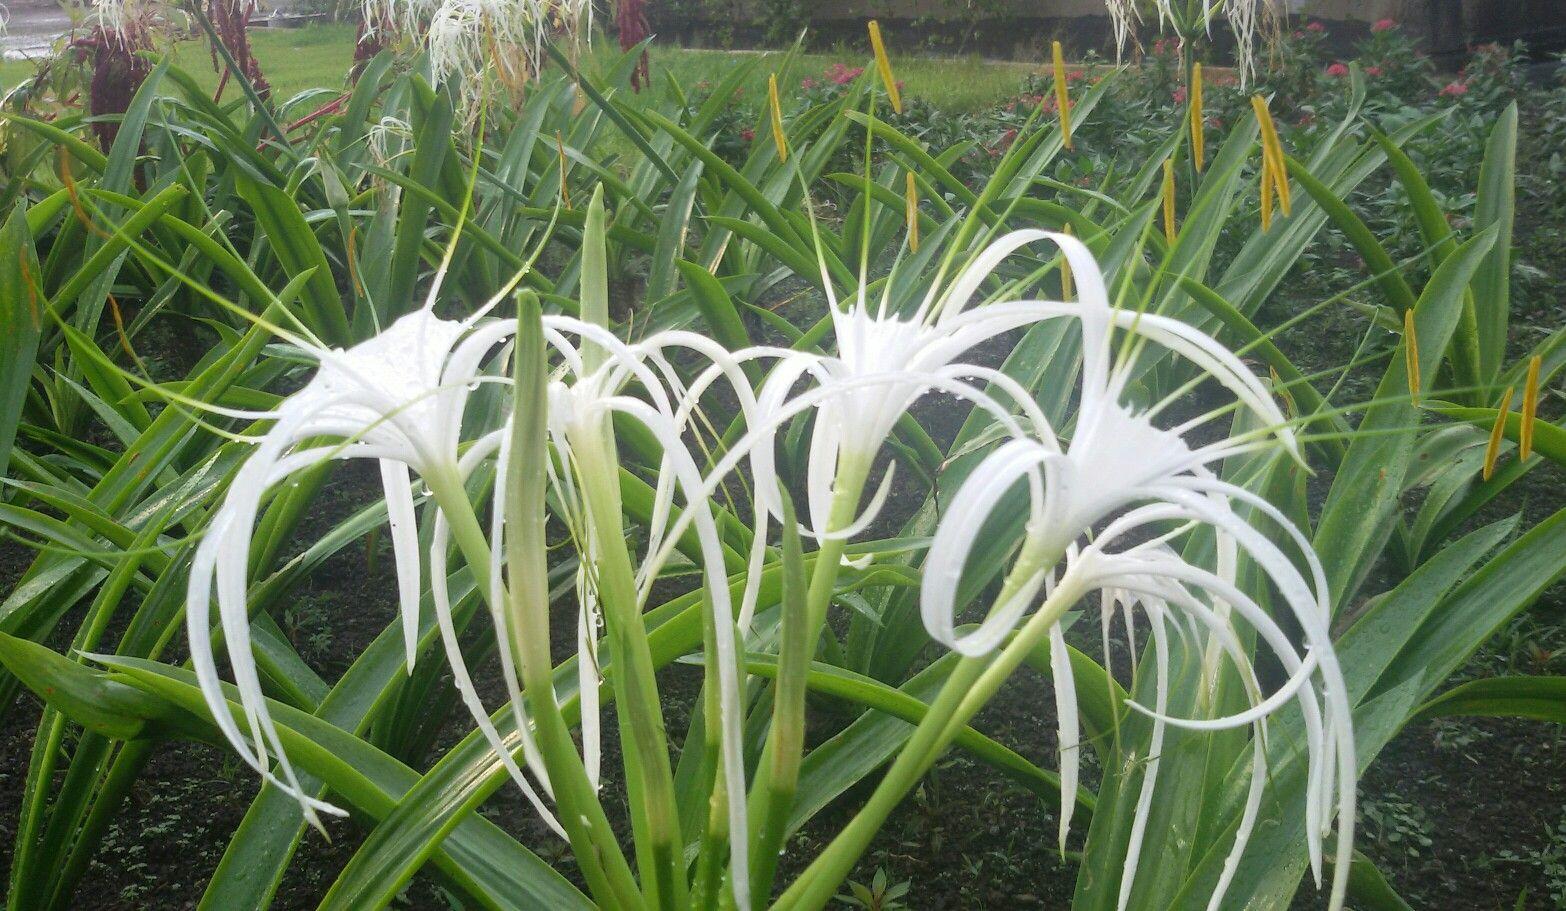 White spider lily flower amaryllidacea hymenocallis tropical white spider lily flower amaryllidacea hymenocallis izmirmasajfo